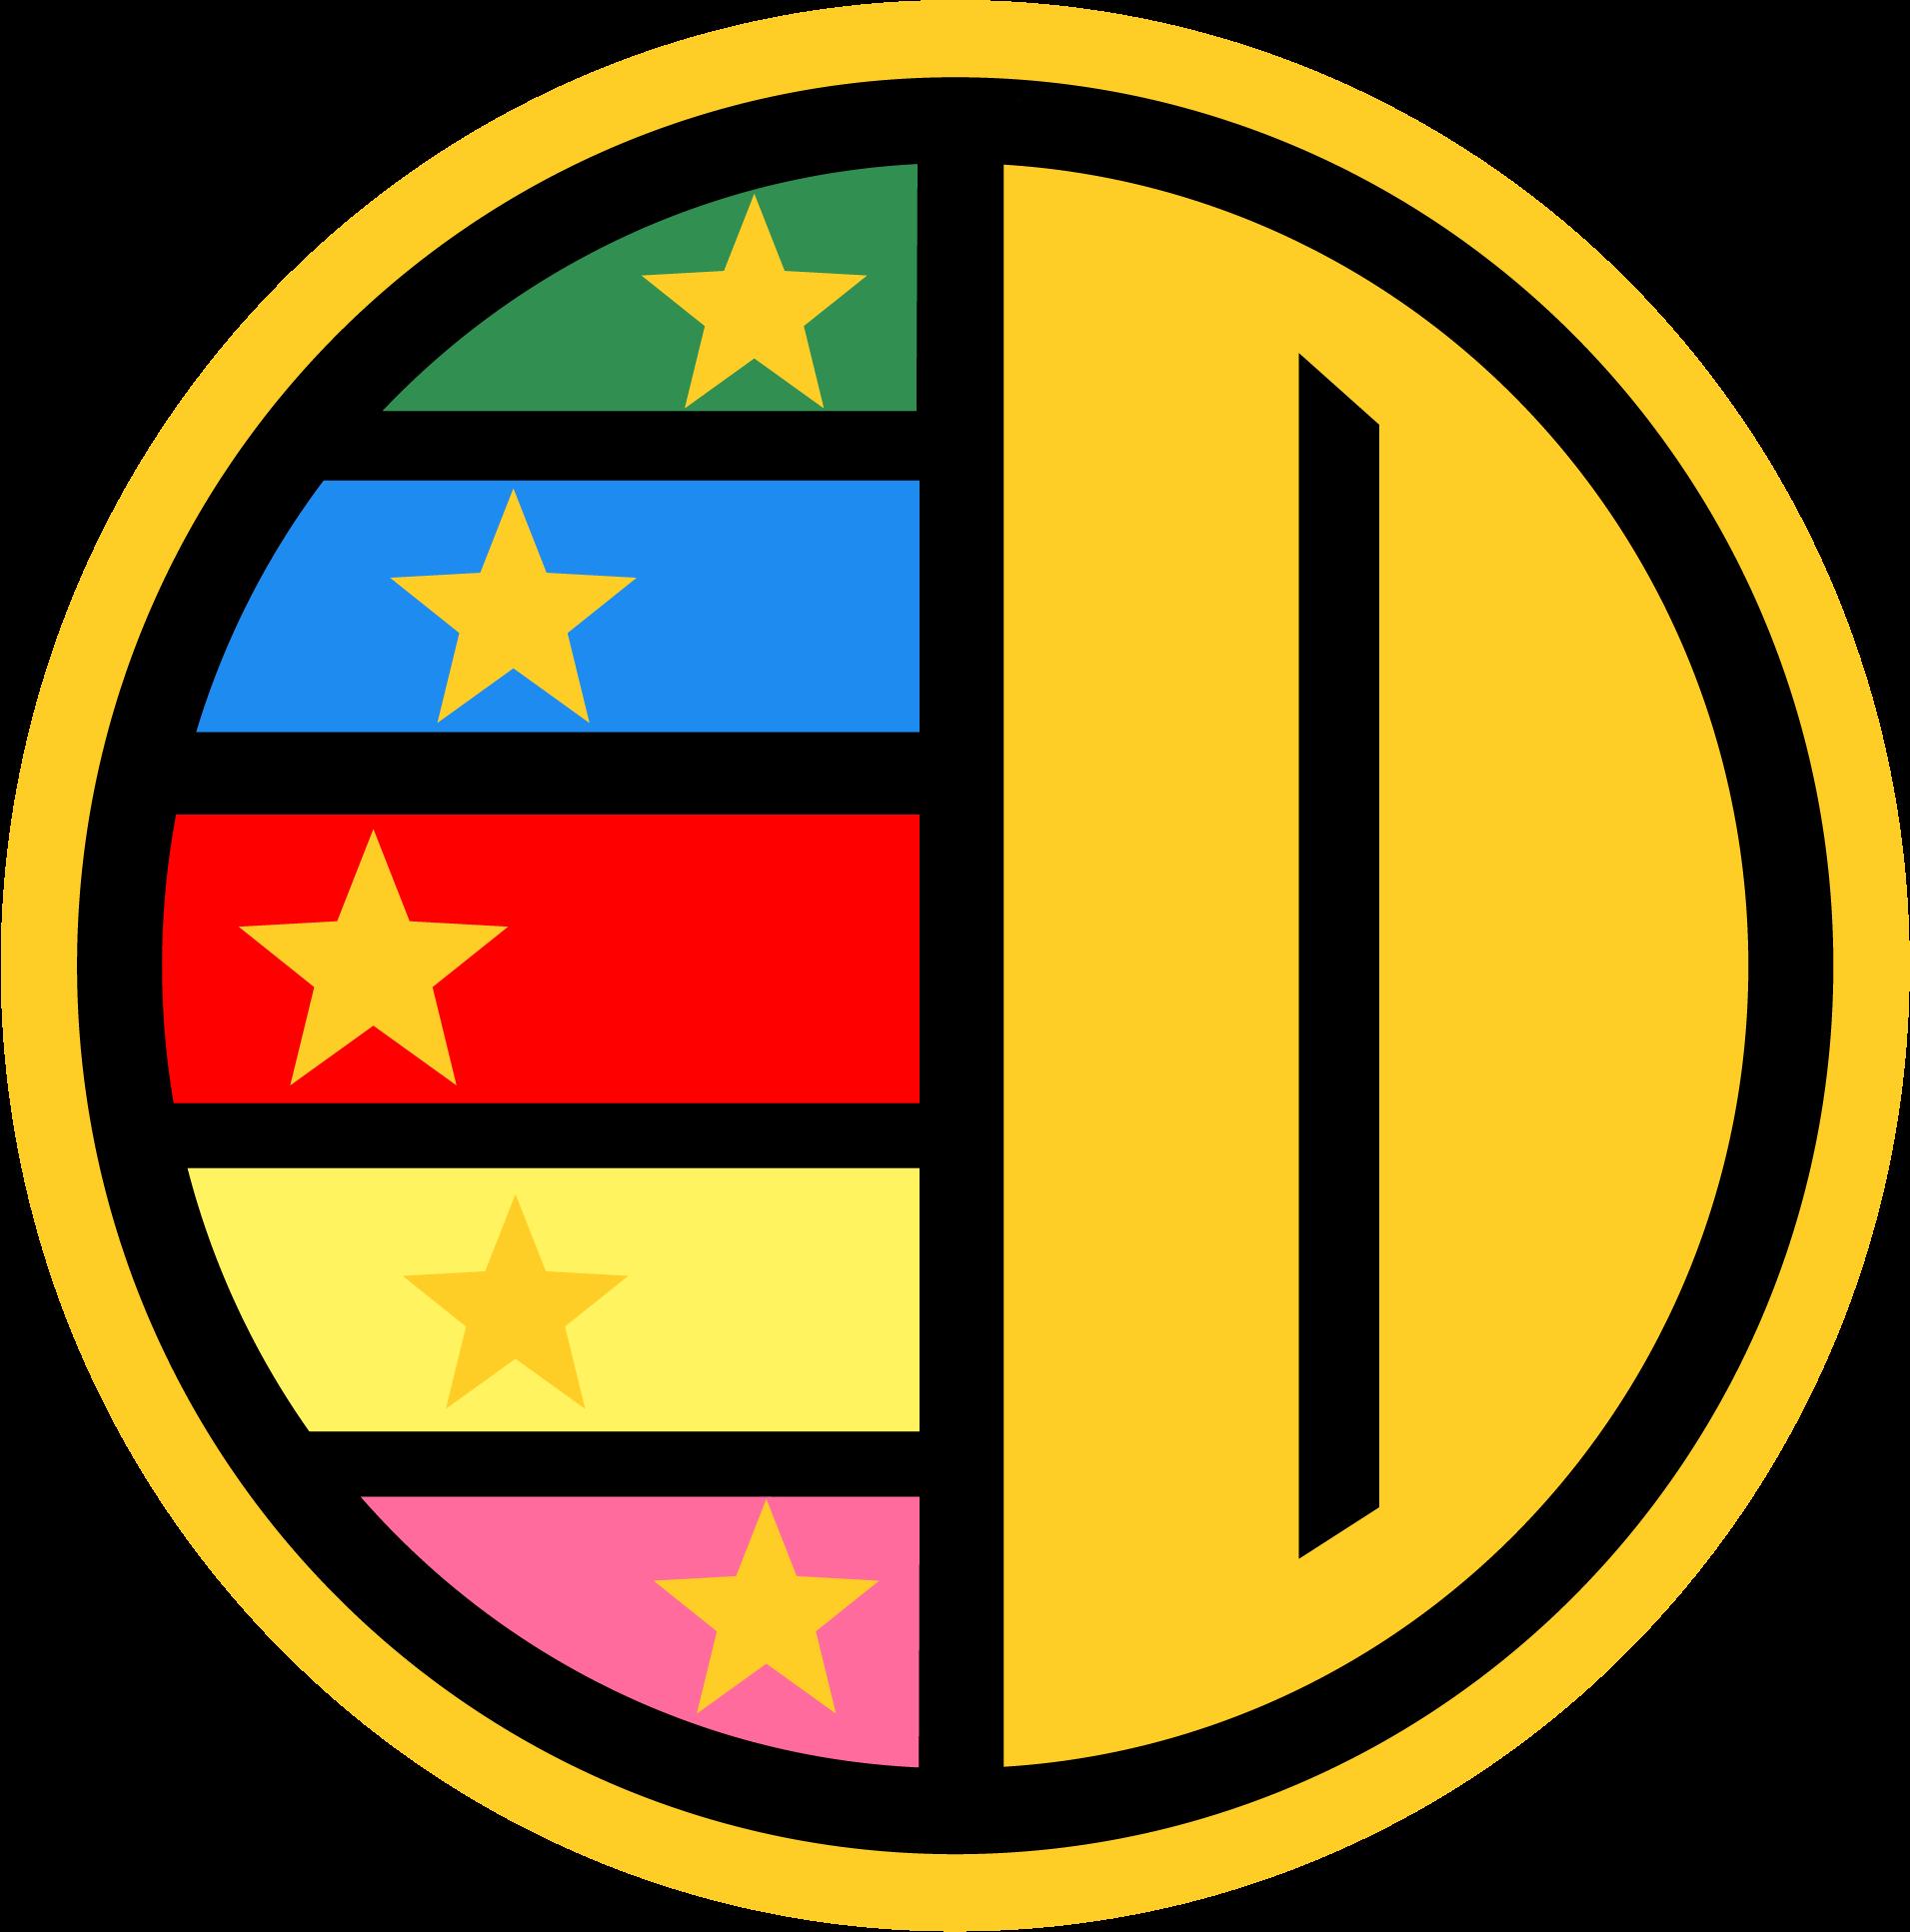 Fichier:Icon-dairanger.png